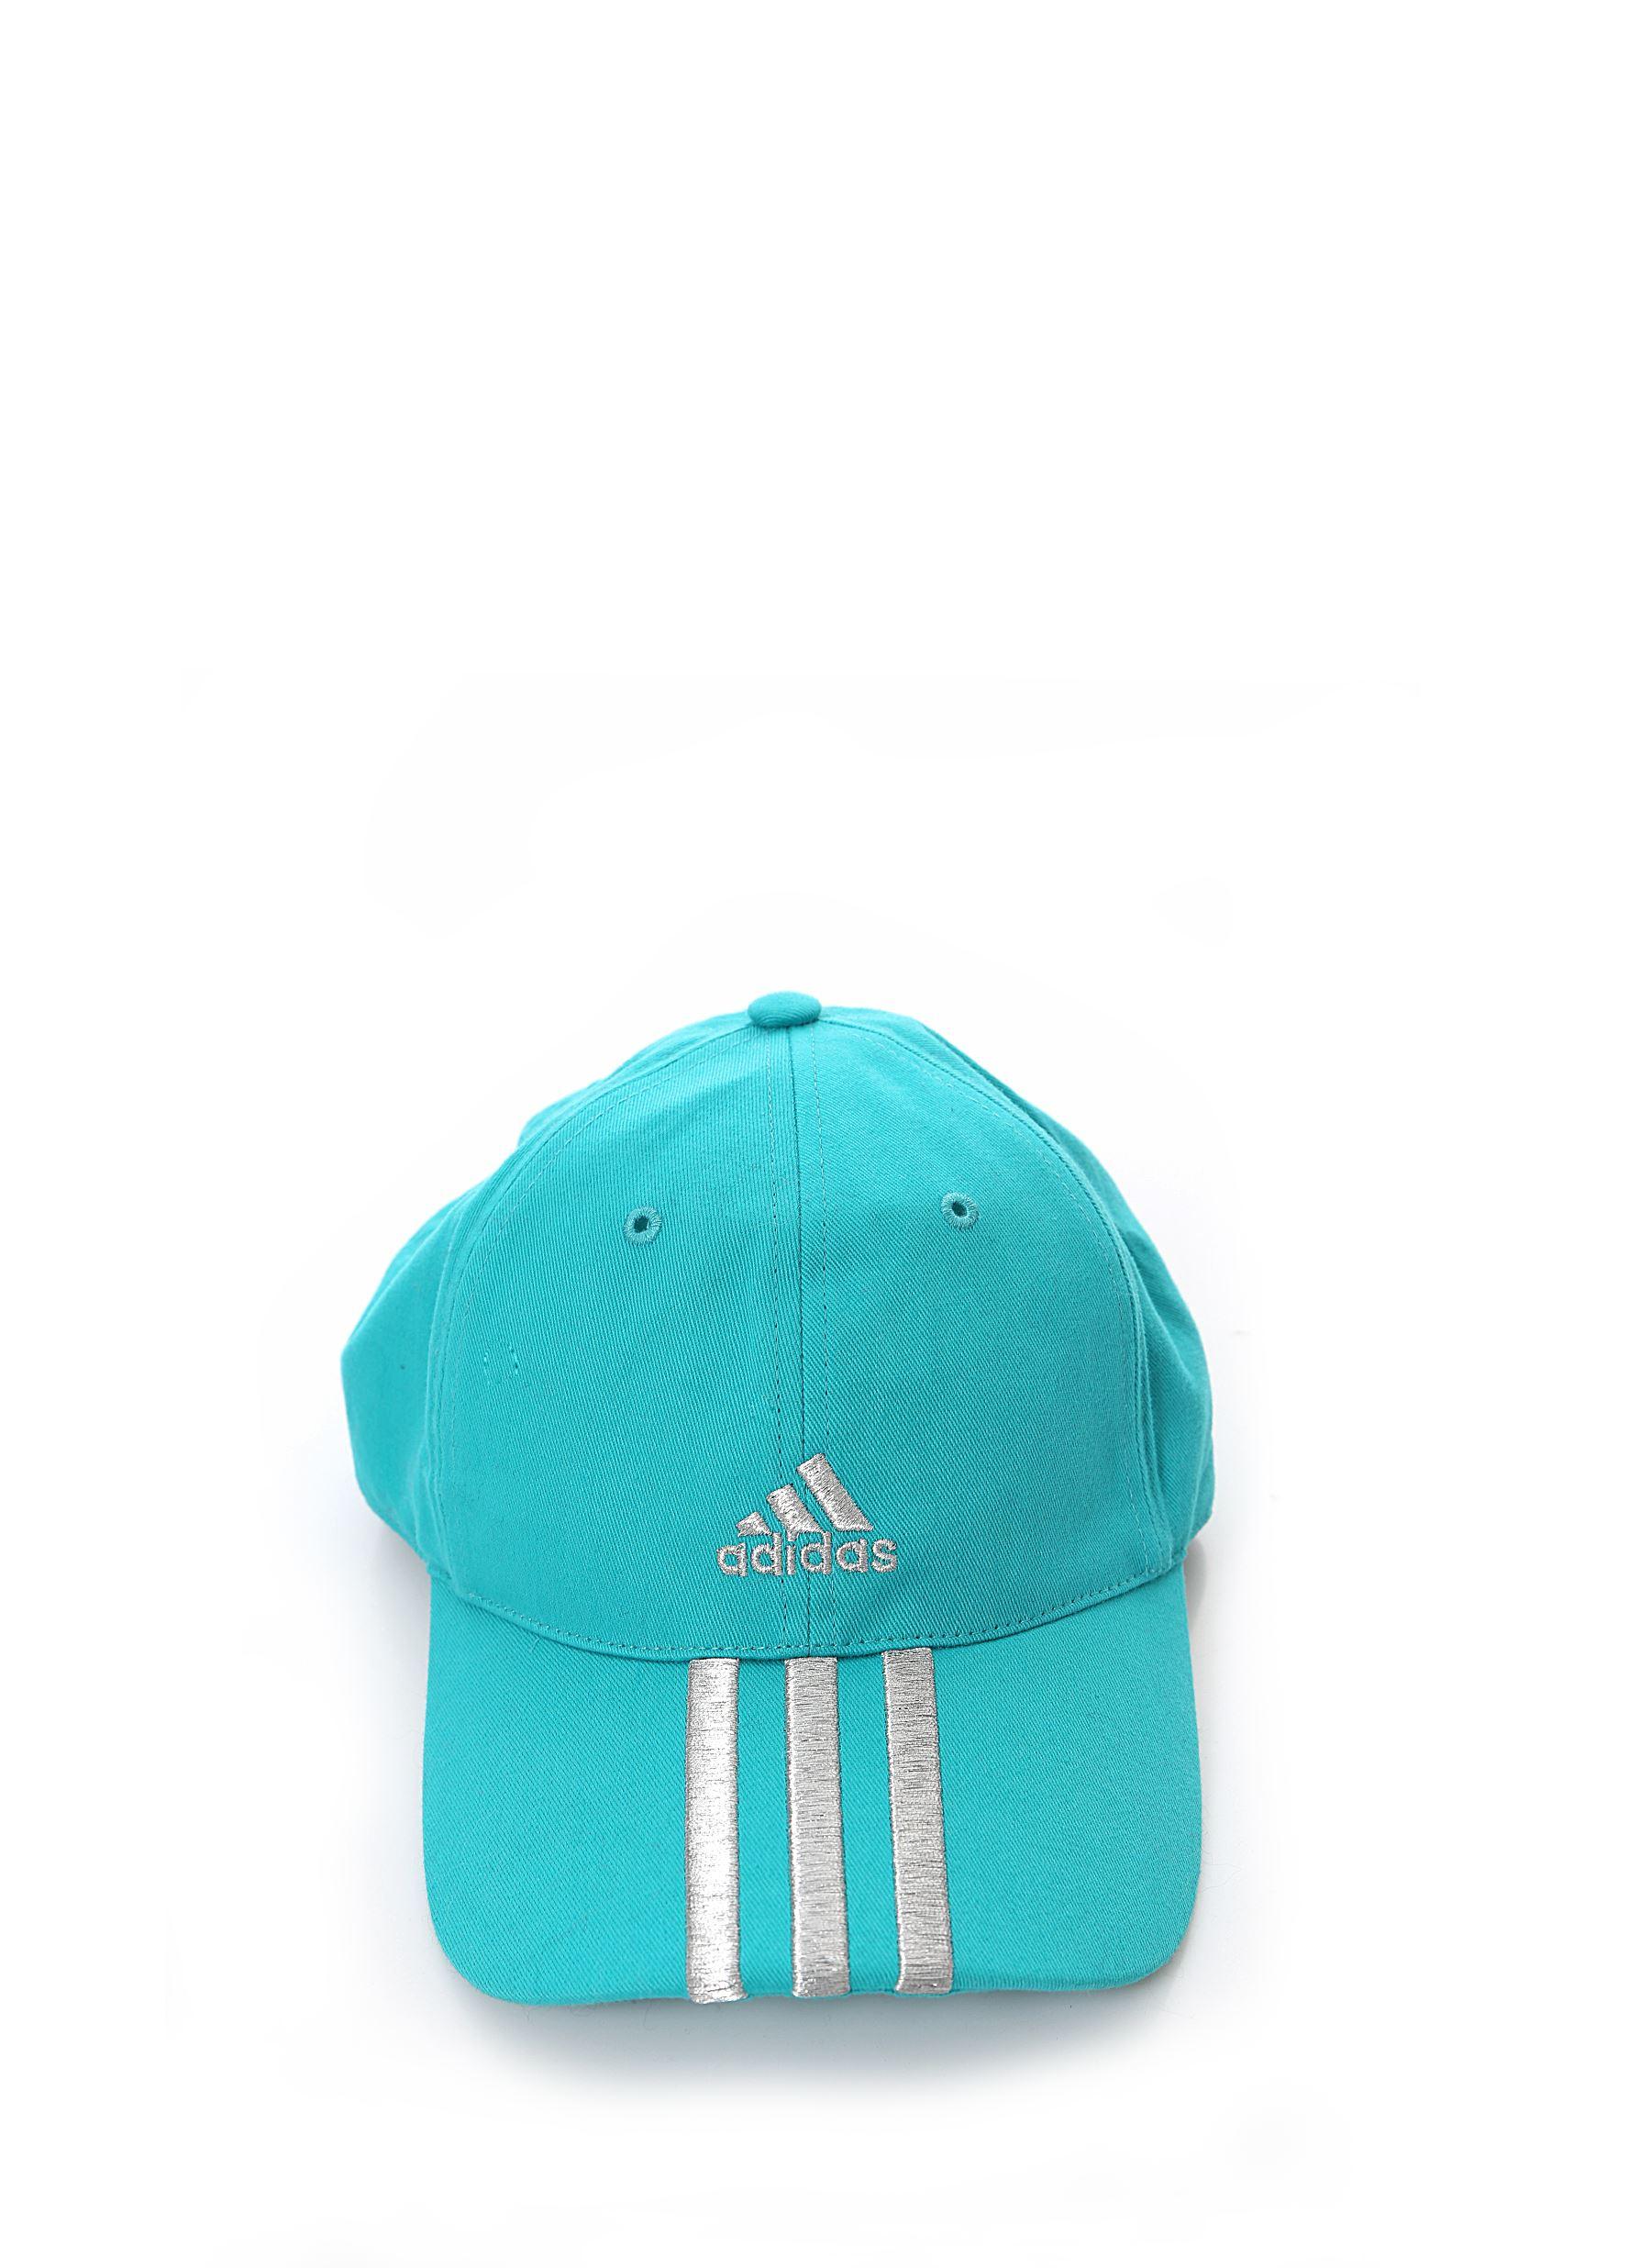 Sports Collection - Γυναικείο Καπέλο ADIDAS